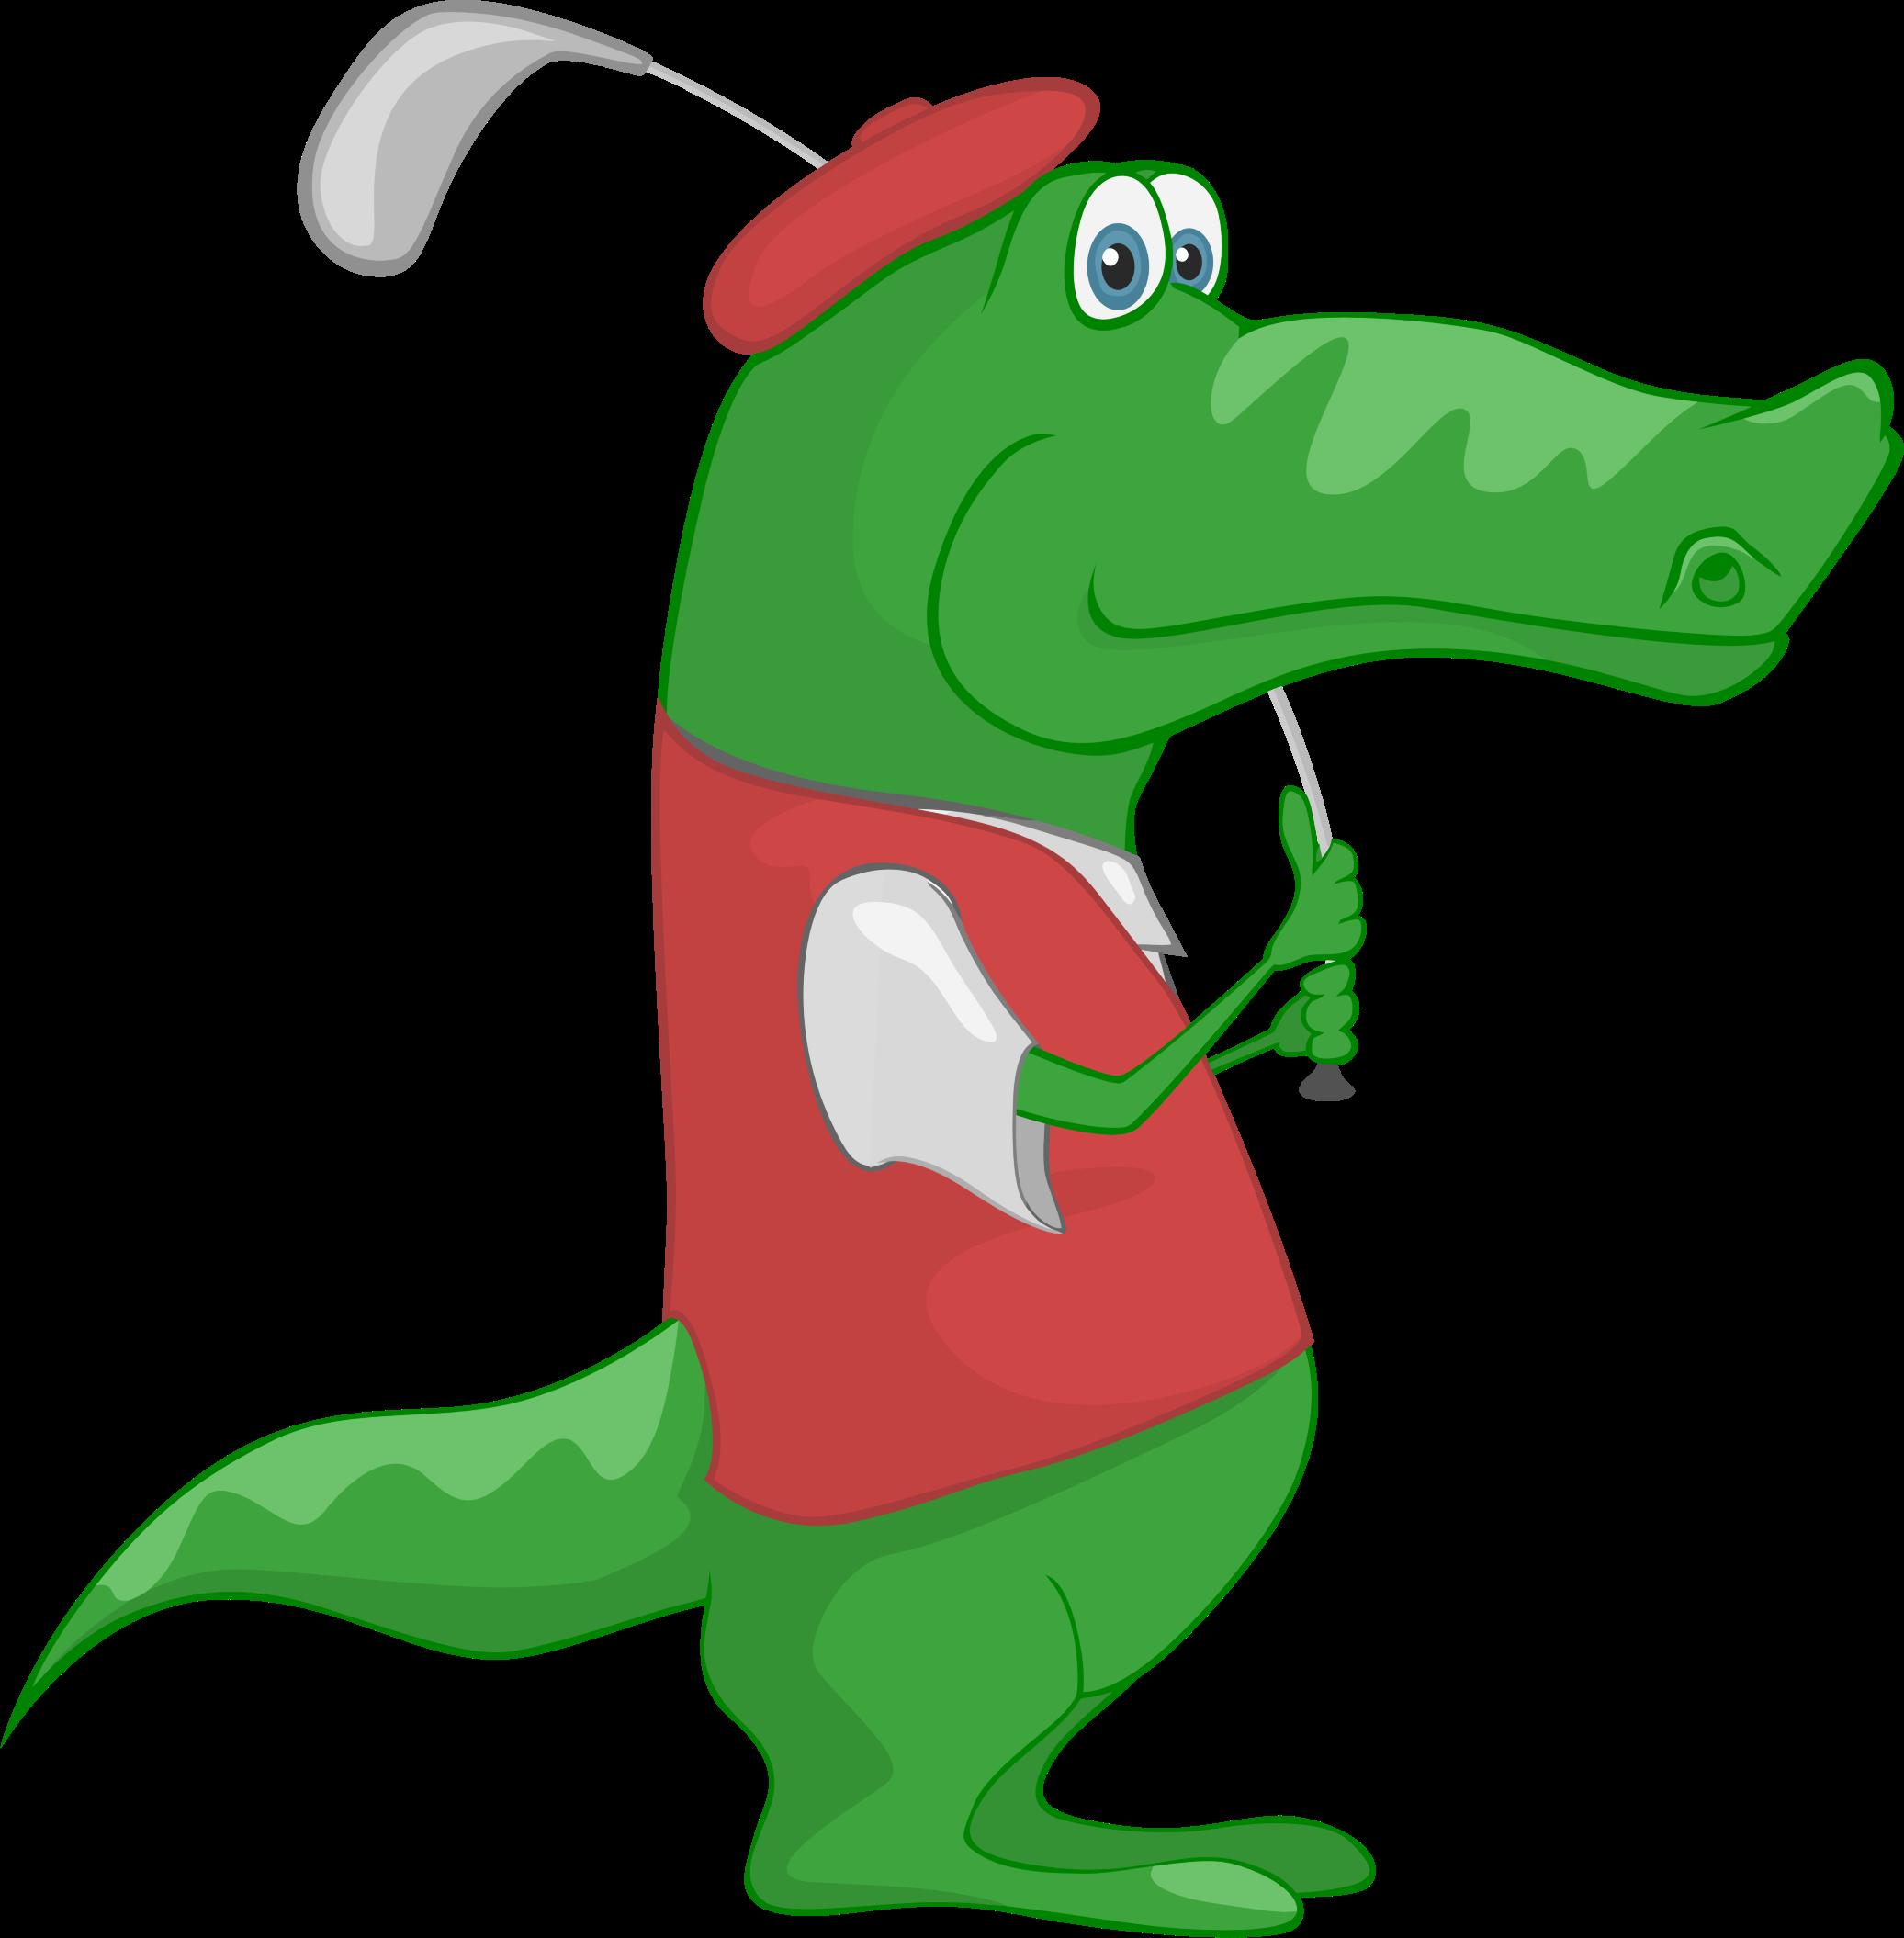 Purple clipart crocodile. Playing golf big image